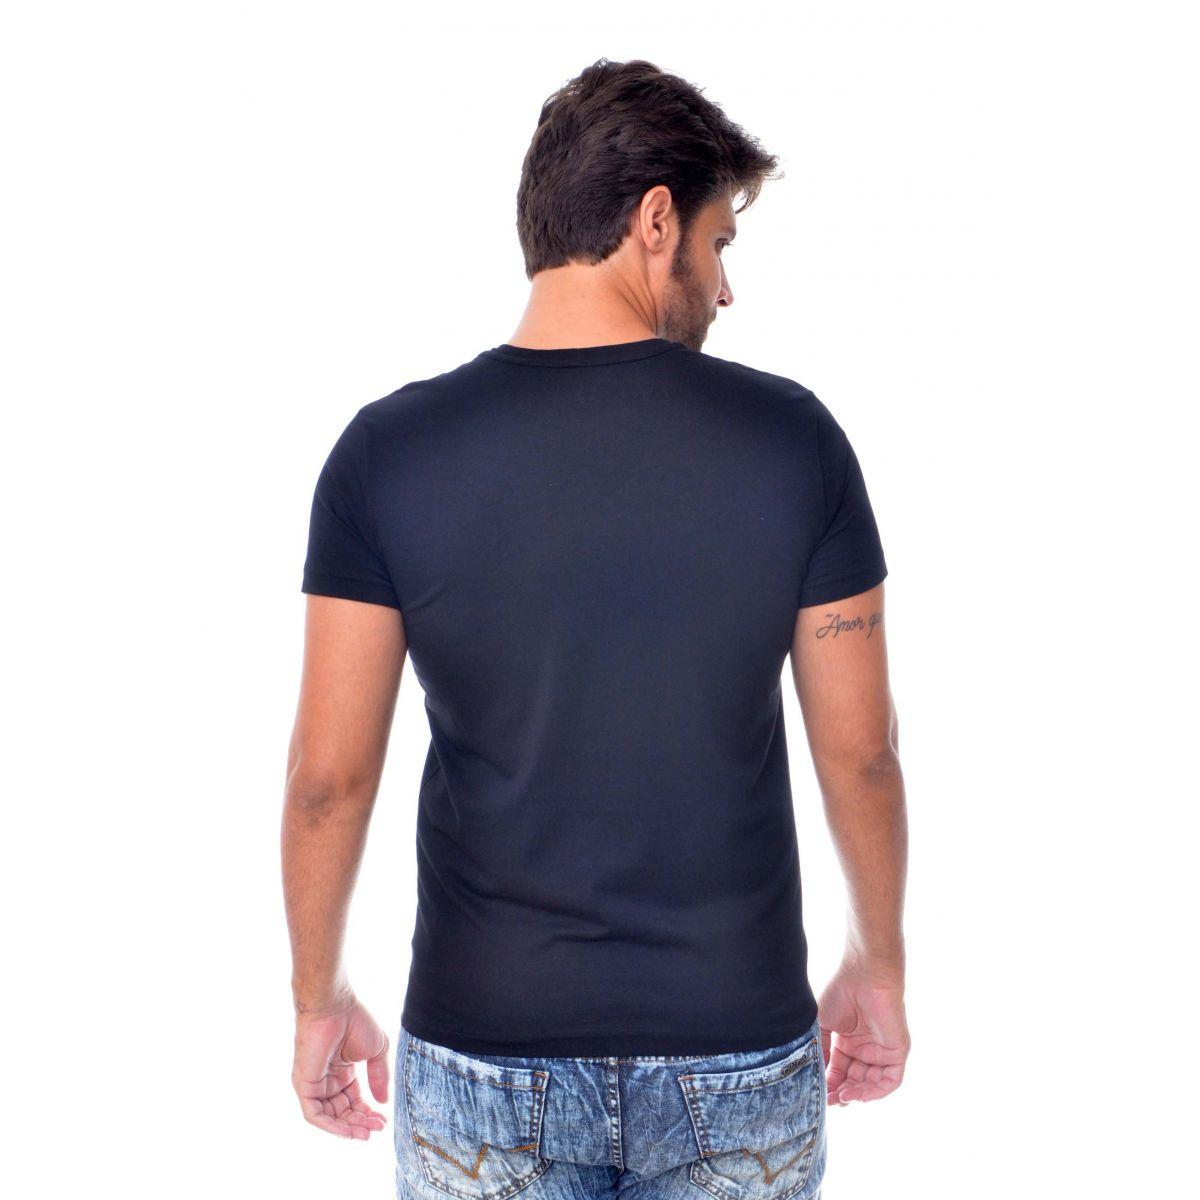 Camiseta Armani Exchange Watch Preta  - Ca Brasileira